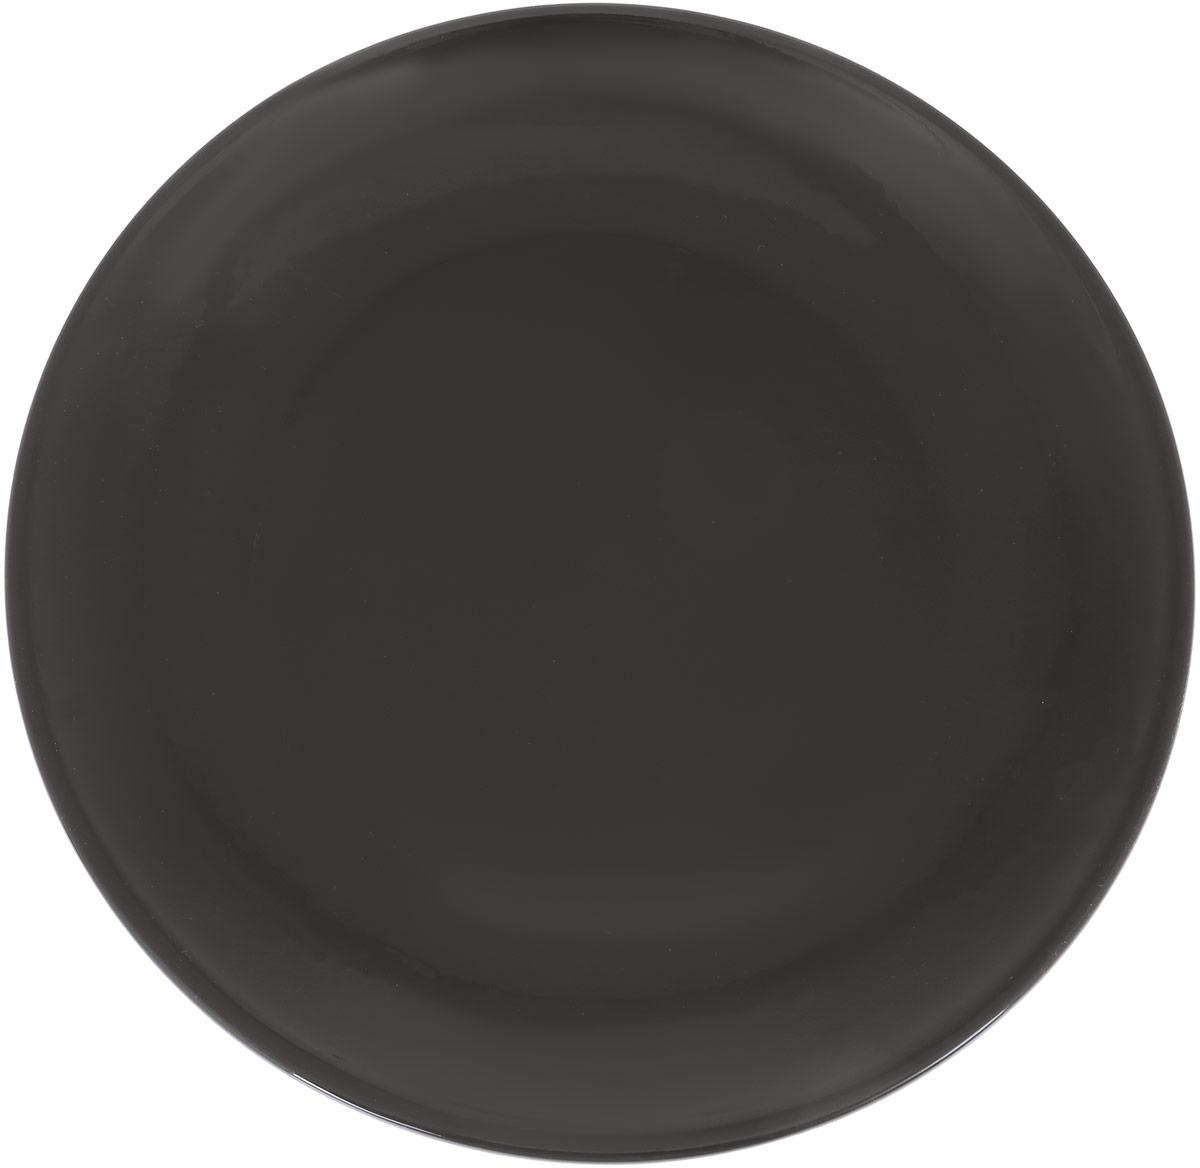 "Тарелка Борисовская керамика ""Старина"", диаметр 22 см"